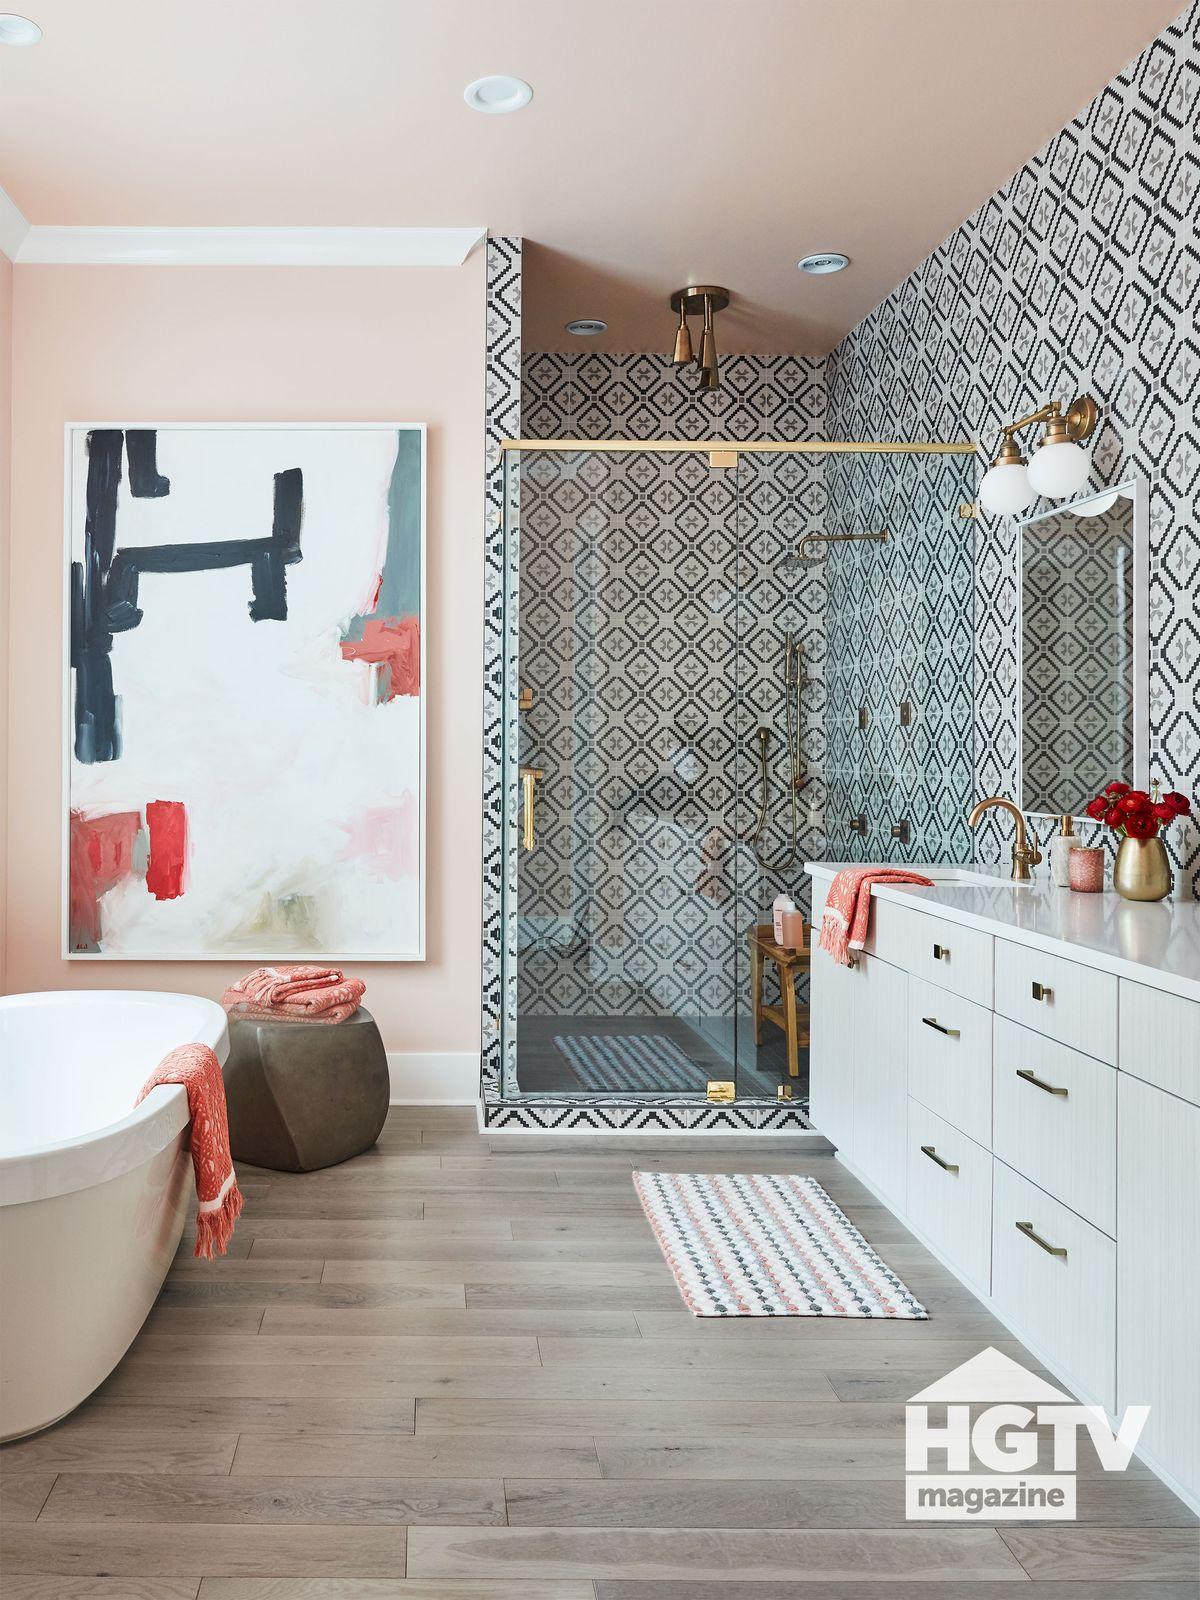 HGTV Dream Home 2020 bathroom featured in HGTV Magazine